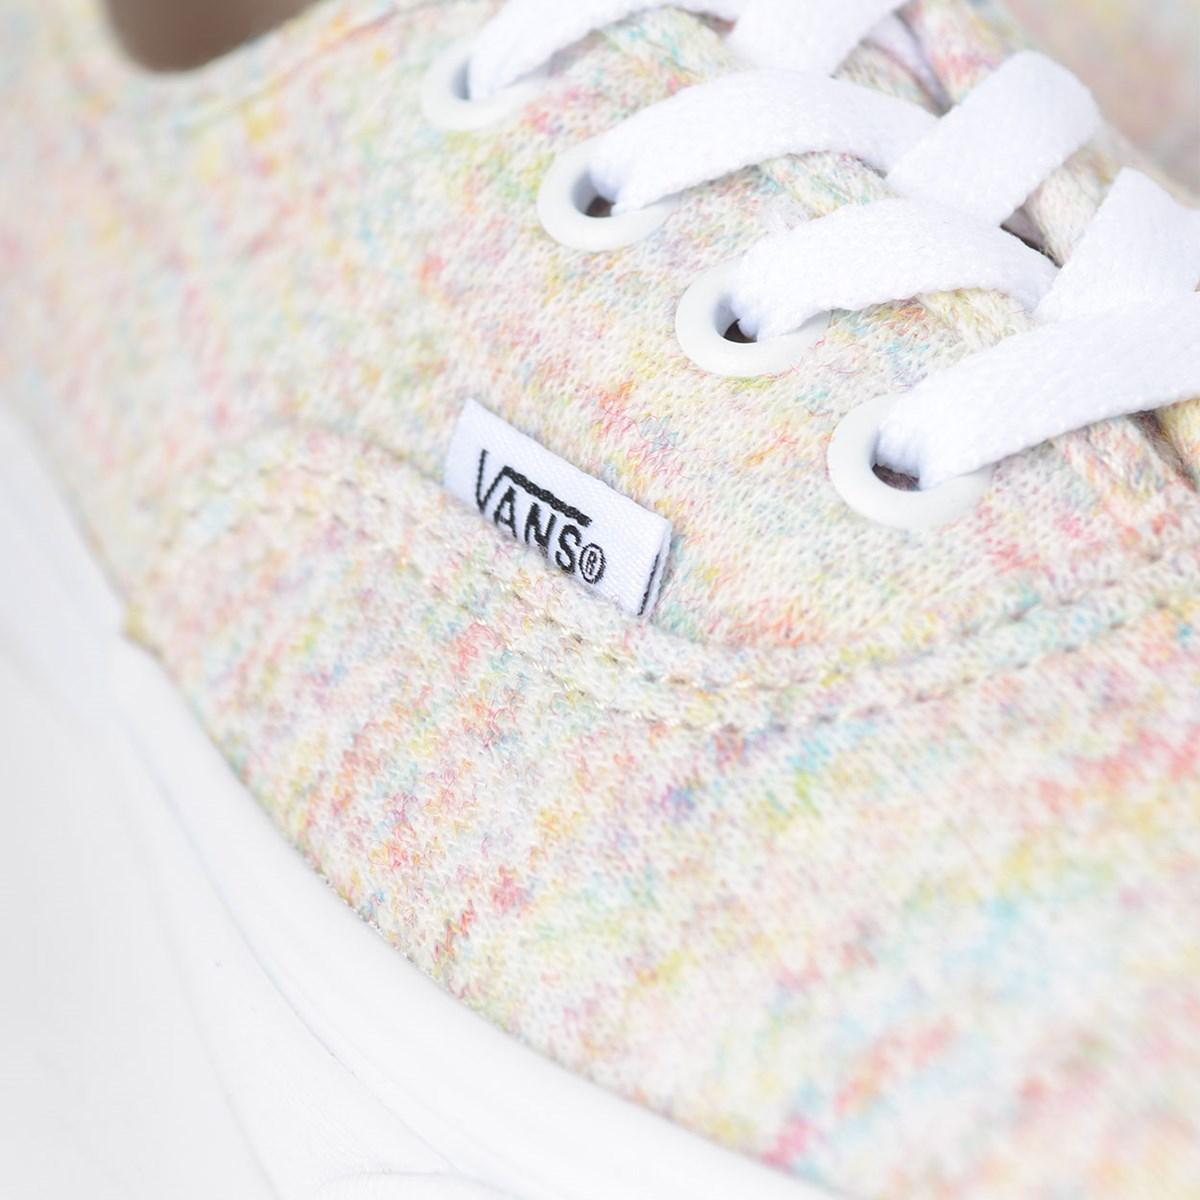 Tênis Vans Authentic Rainbow Jersey Multi True White VN0A2Z5IWN5